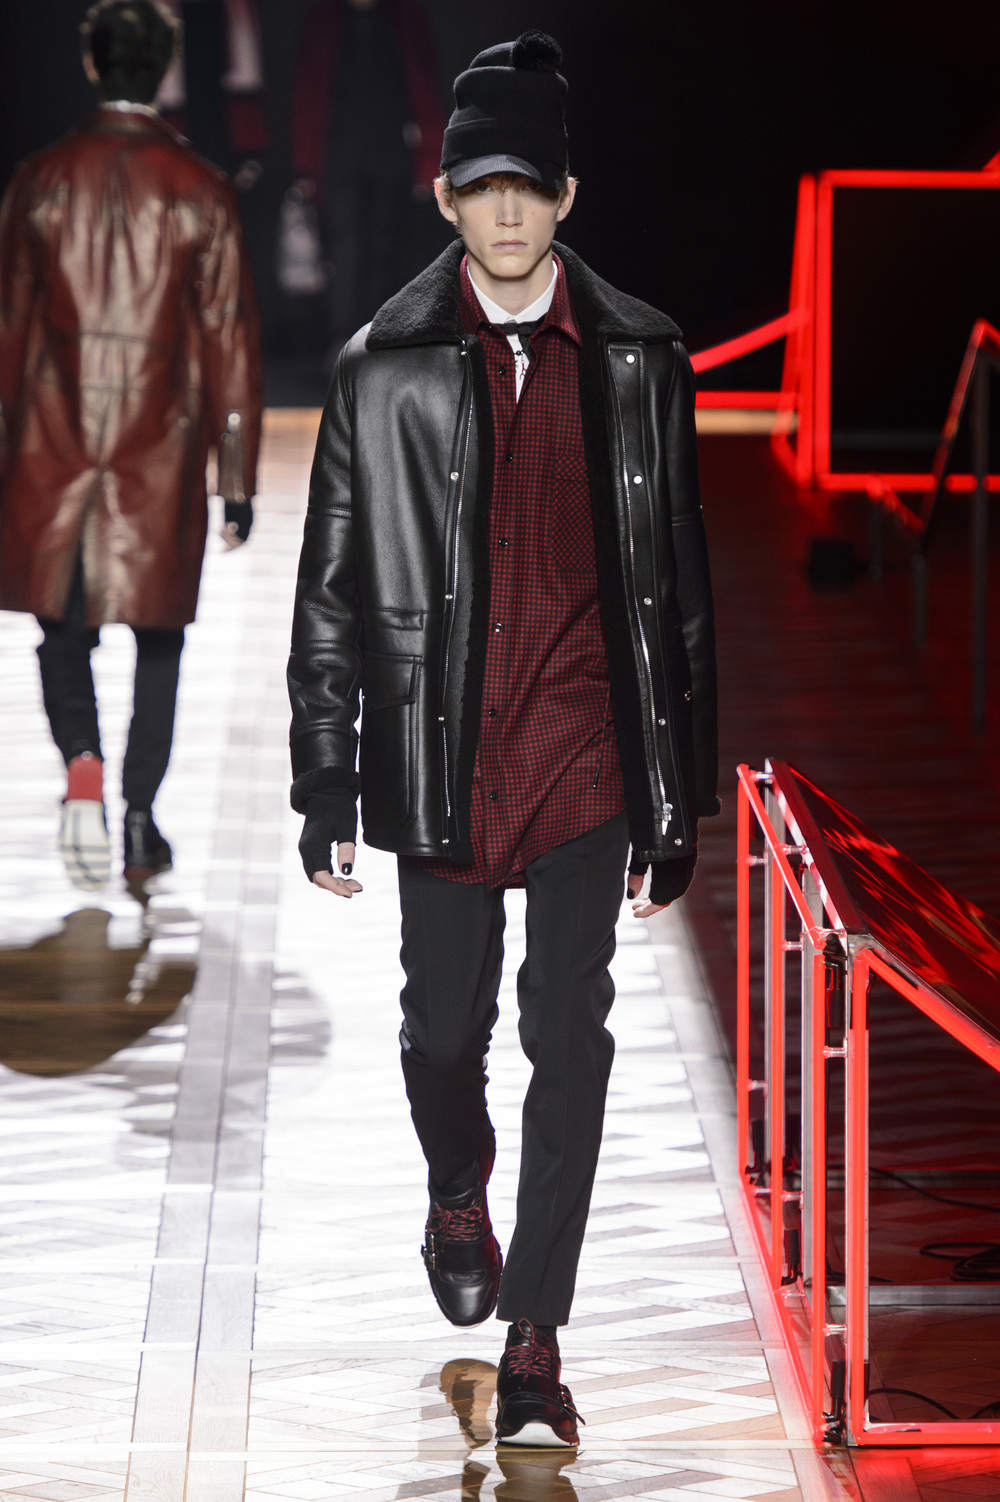 Dior_Homme_Hiver2016-17_look_13.JPG